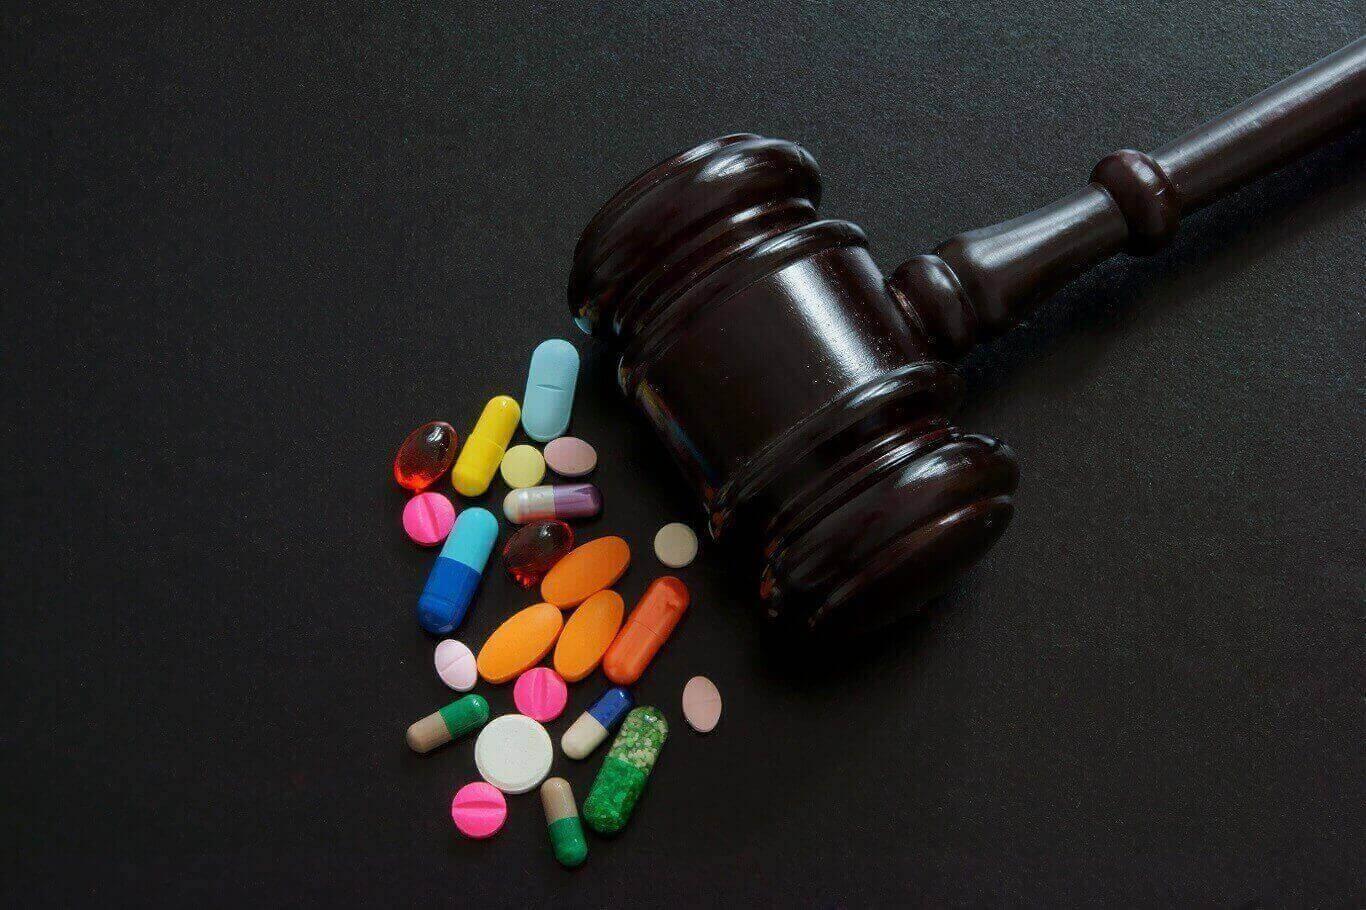 class action lawsuit against pharmaceutical companies